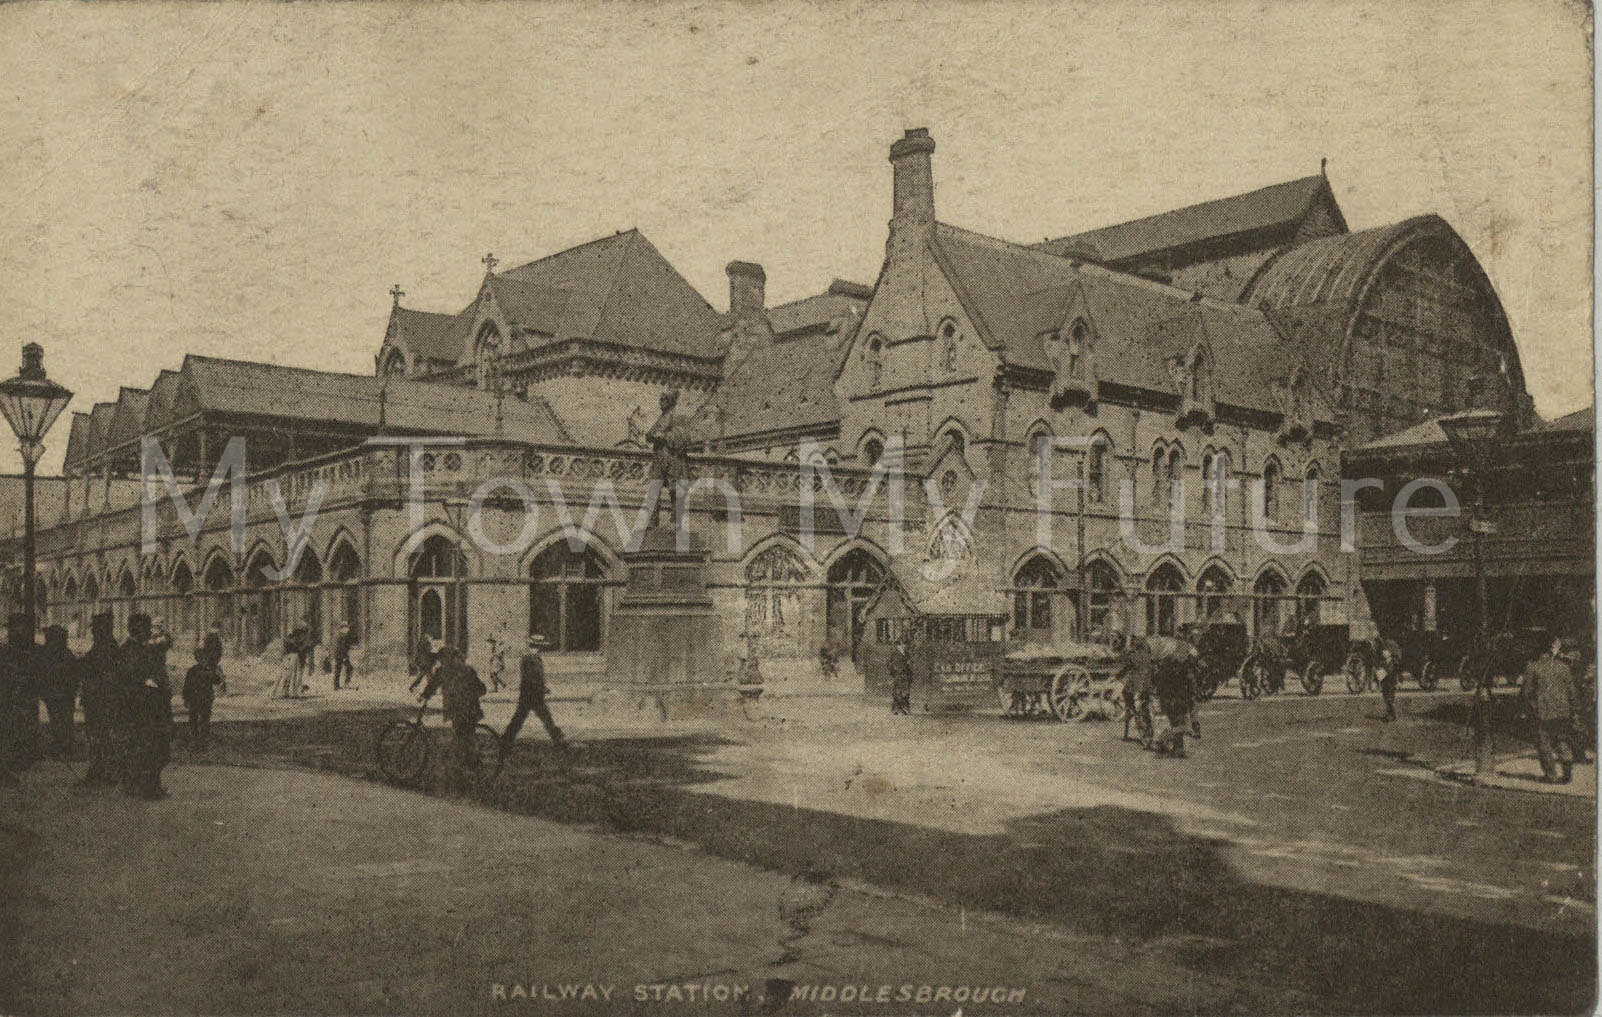 Middlesbrough Railway Station - 1922